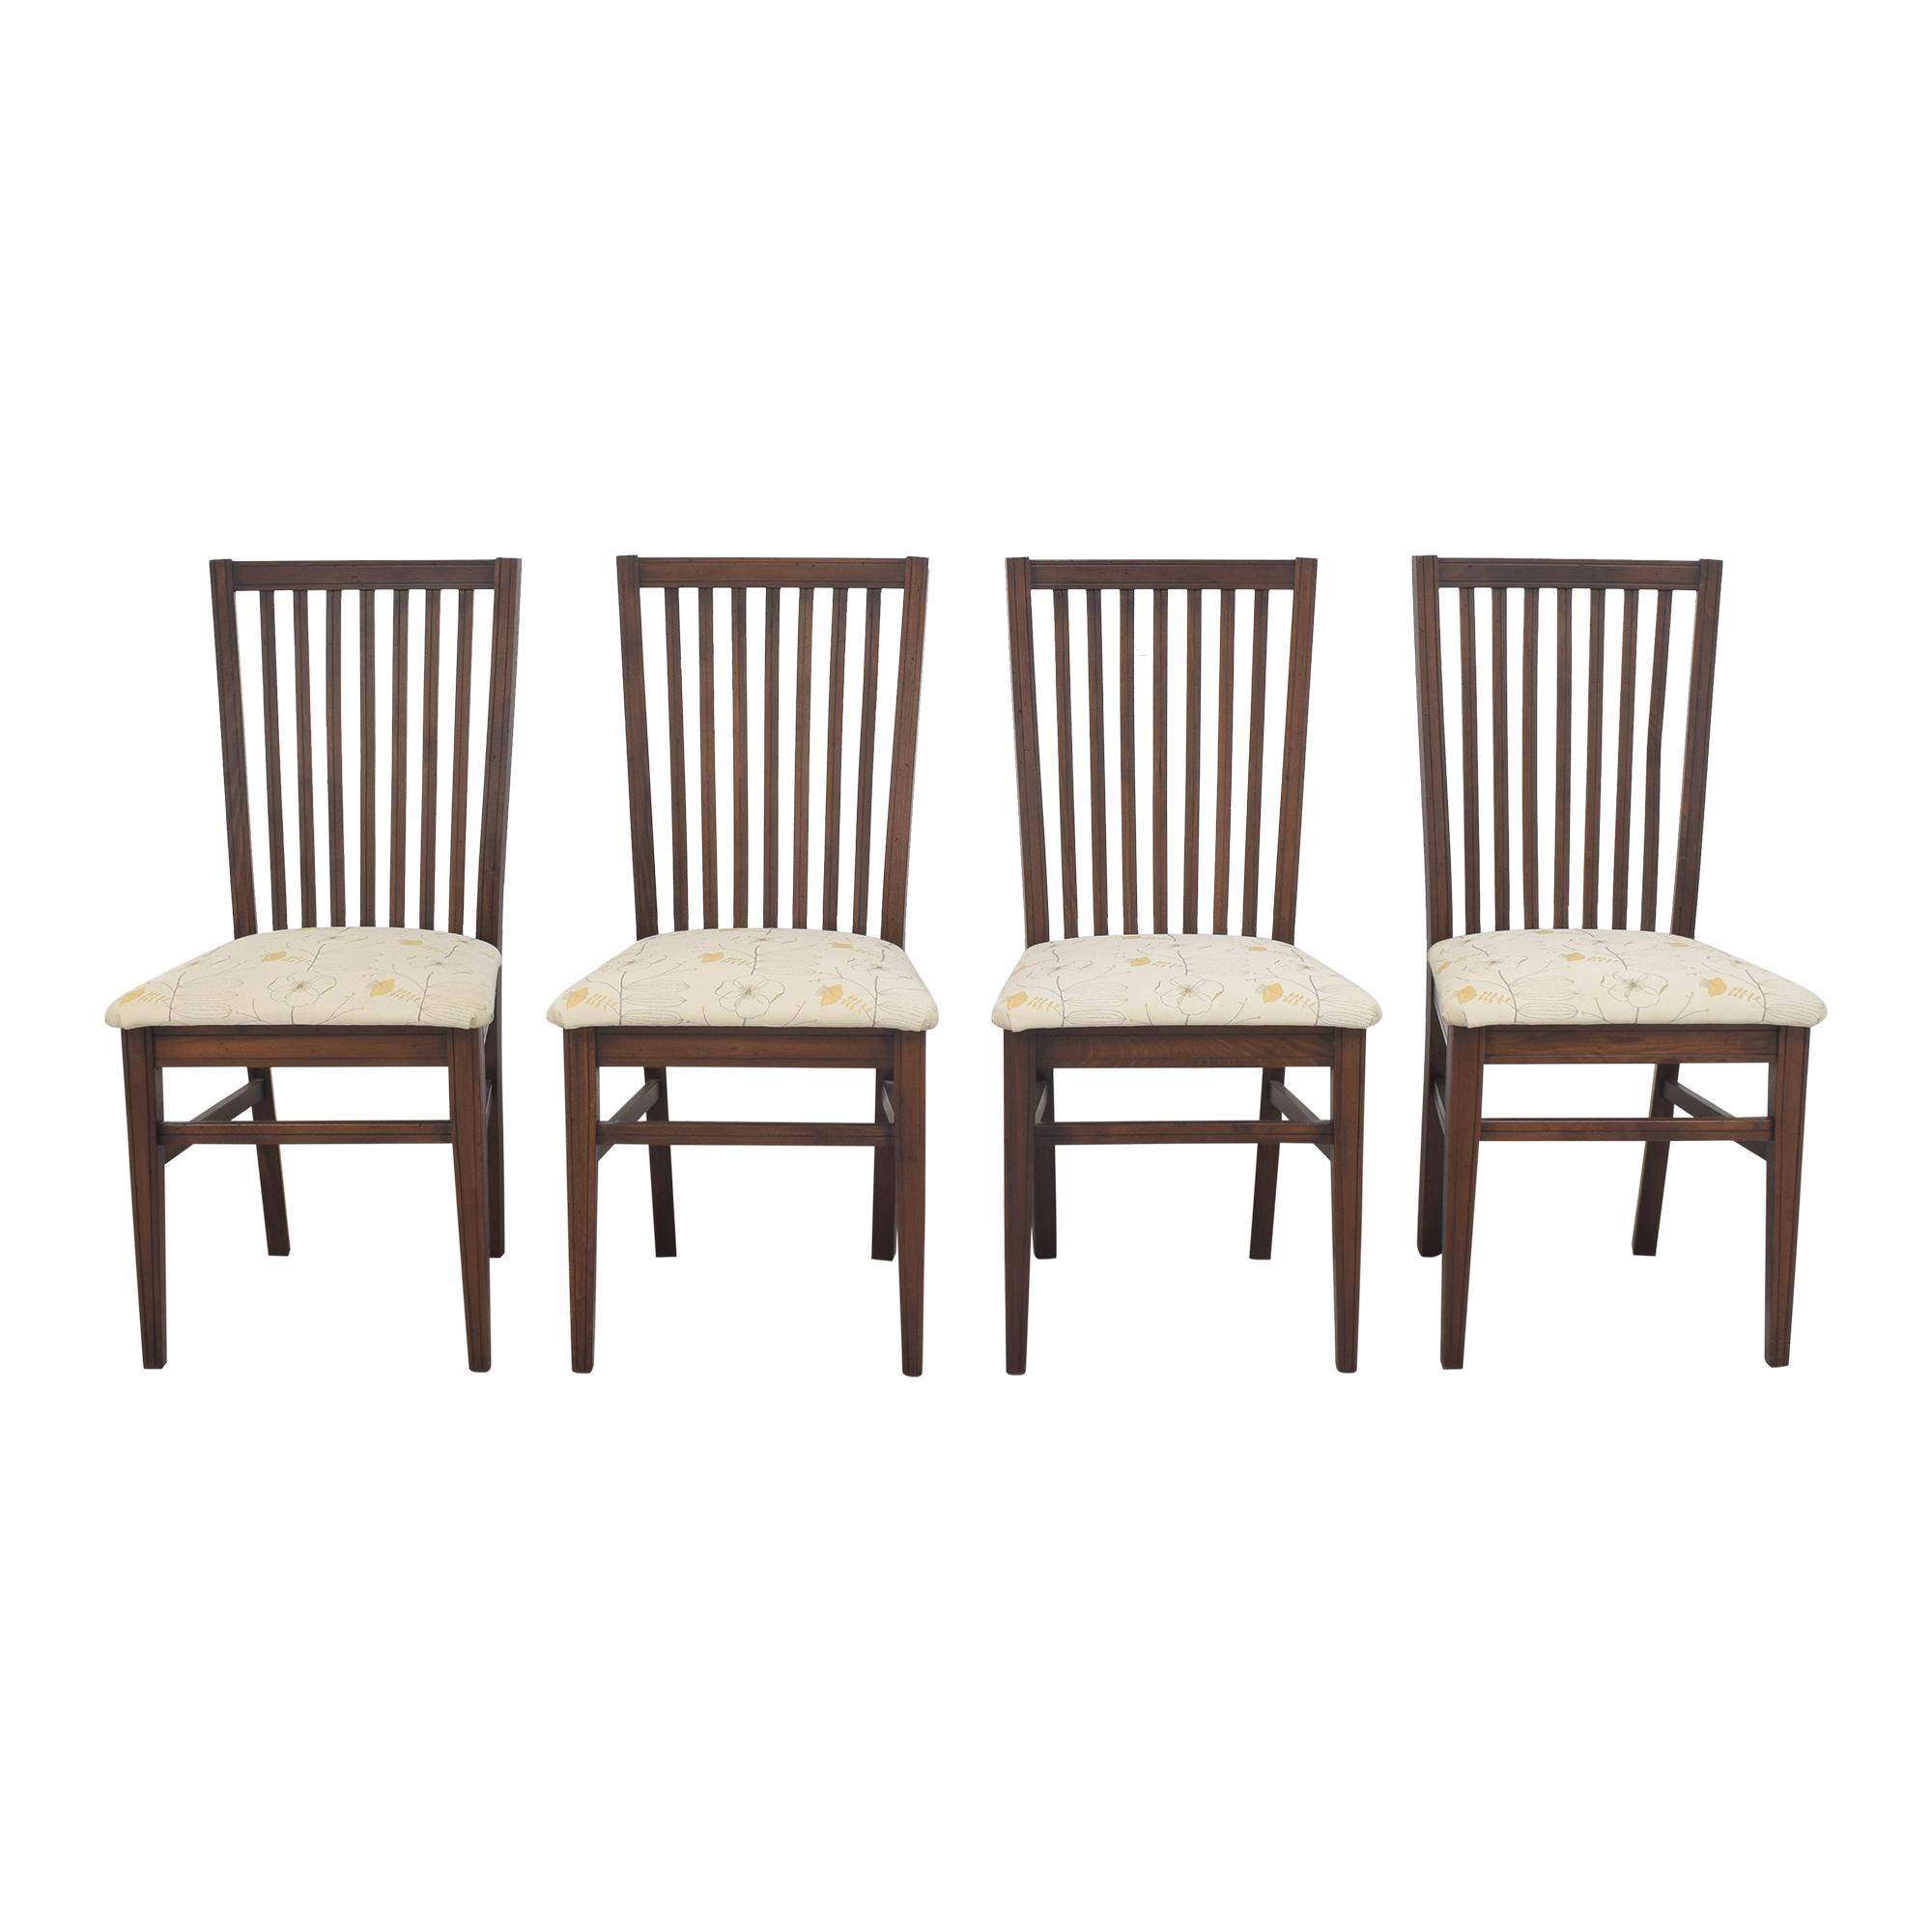 buy Arhaus Anna Dining Side Chairs Arhaus